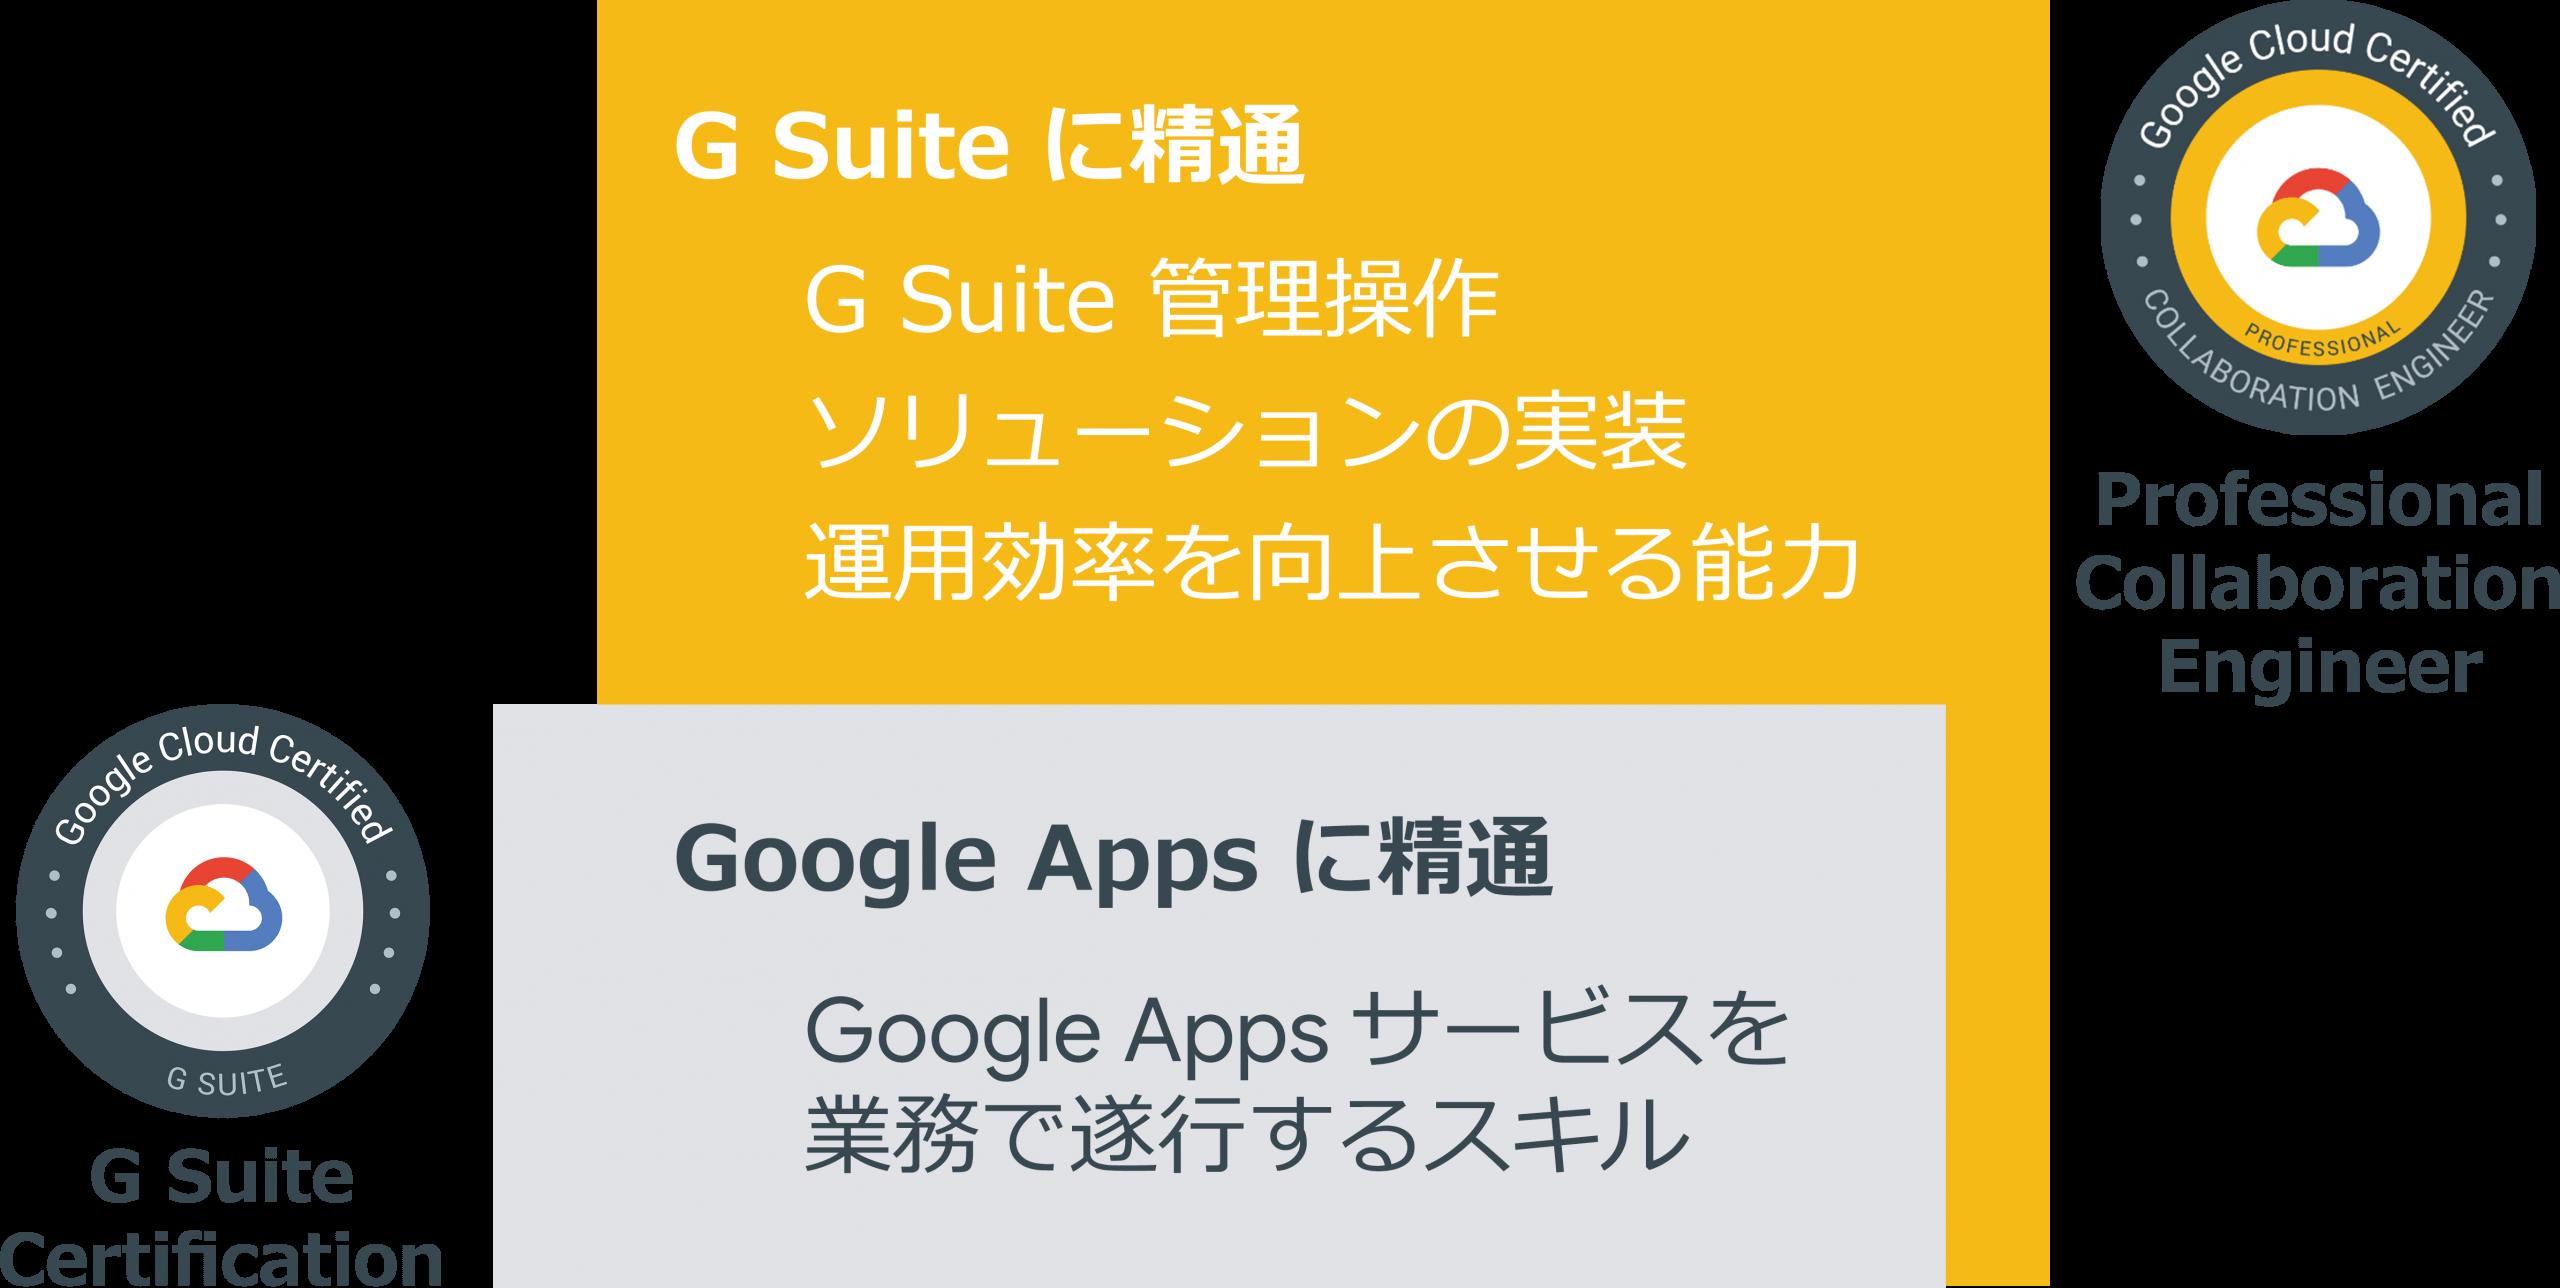 G Suite 認定資格 とProfessional Collaboration Engineer の違い